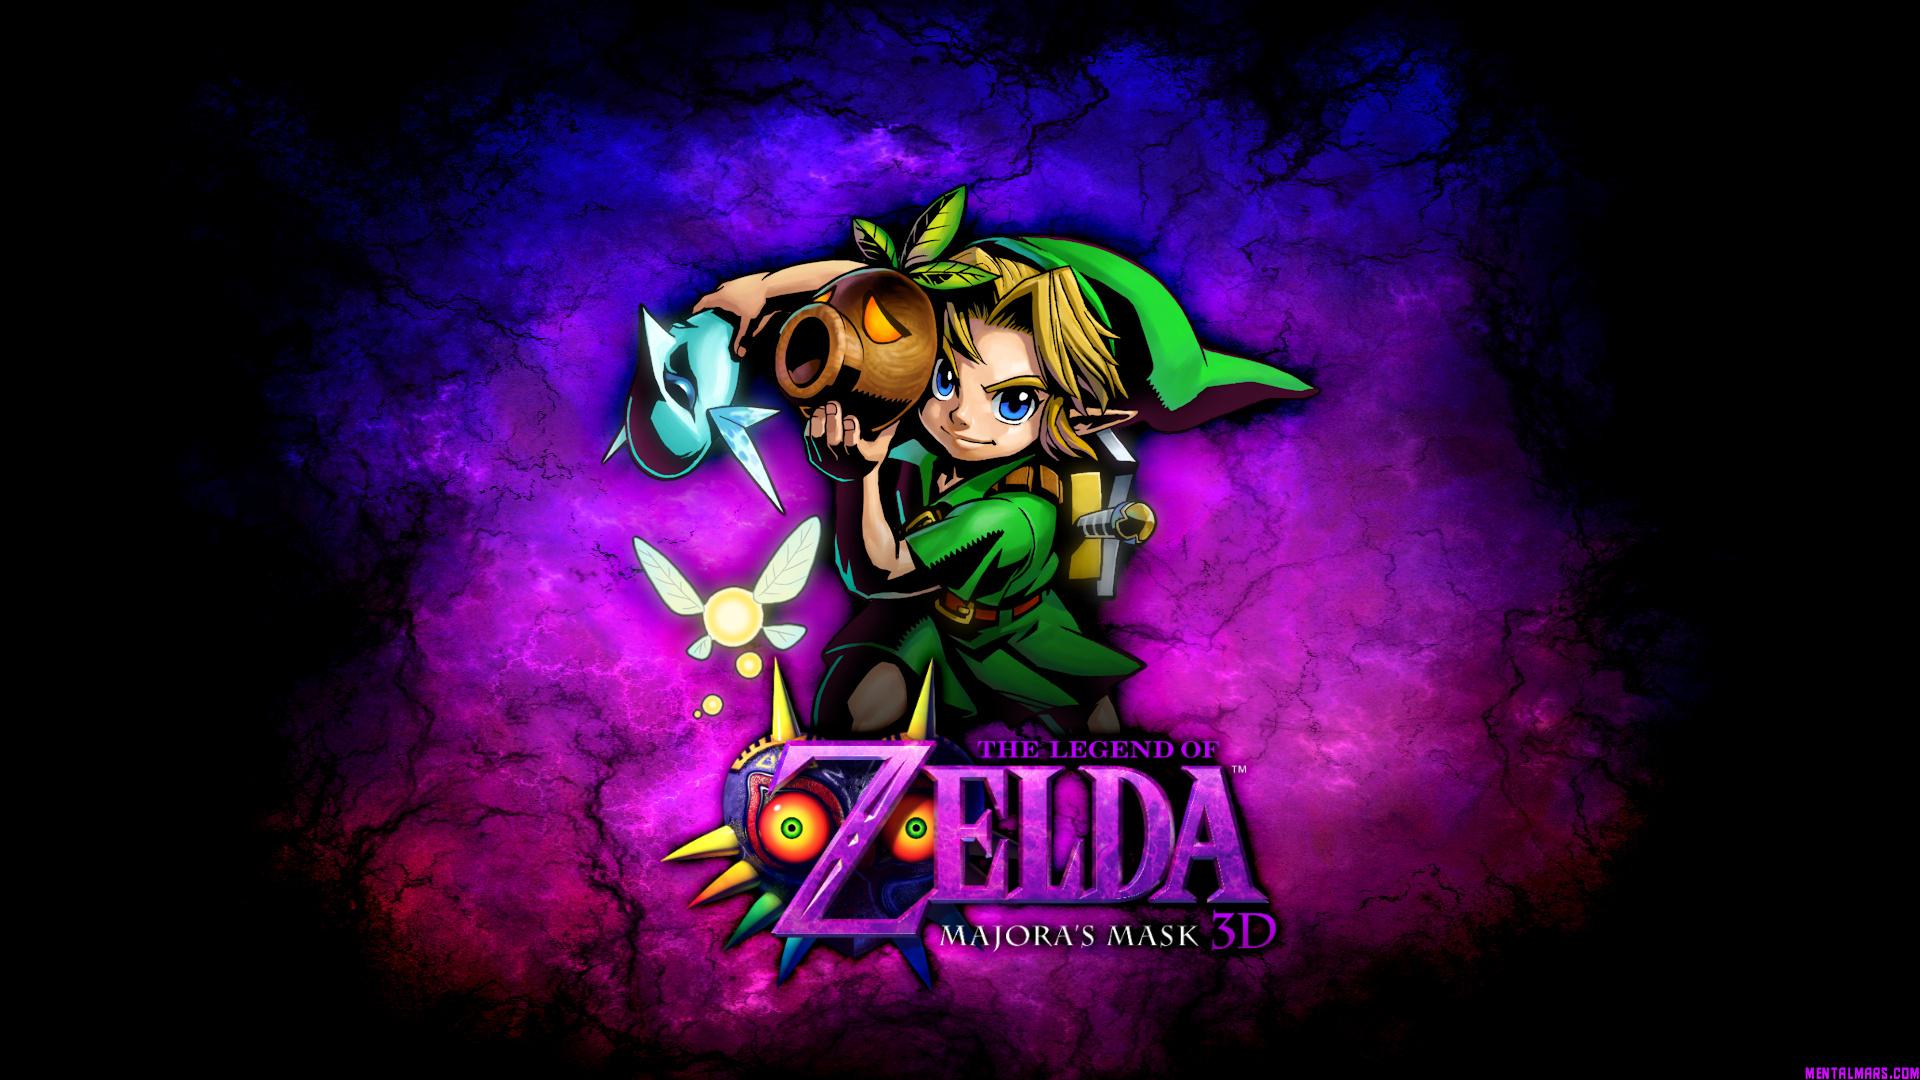 Legend Of Zelda Majoras Mask Ps4wallpaperscom